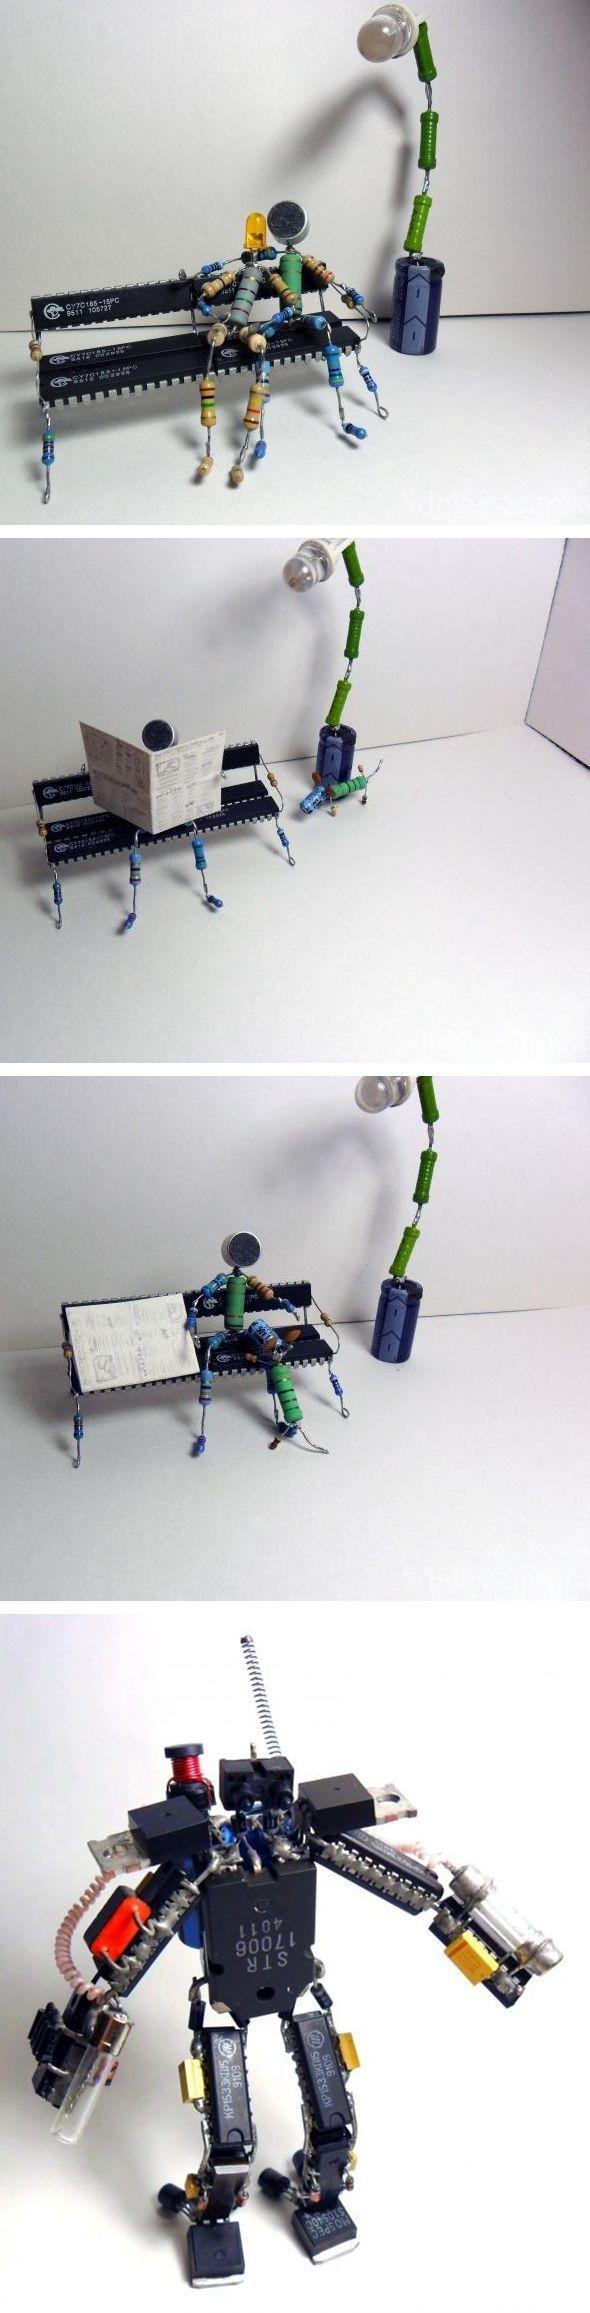 3-elektronik-gorsel-komponentler-rerim-figur-electronic-art-photo